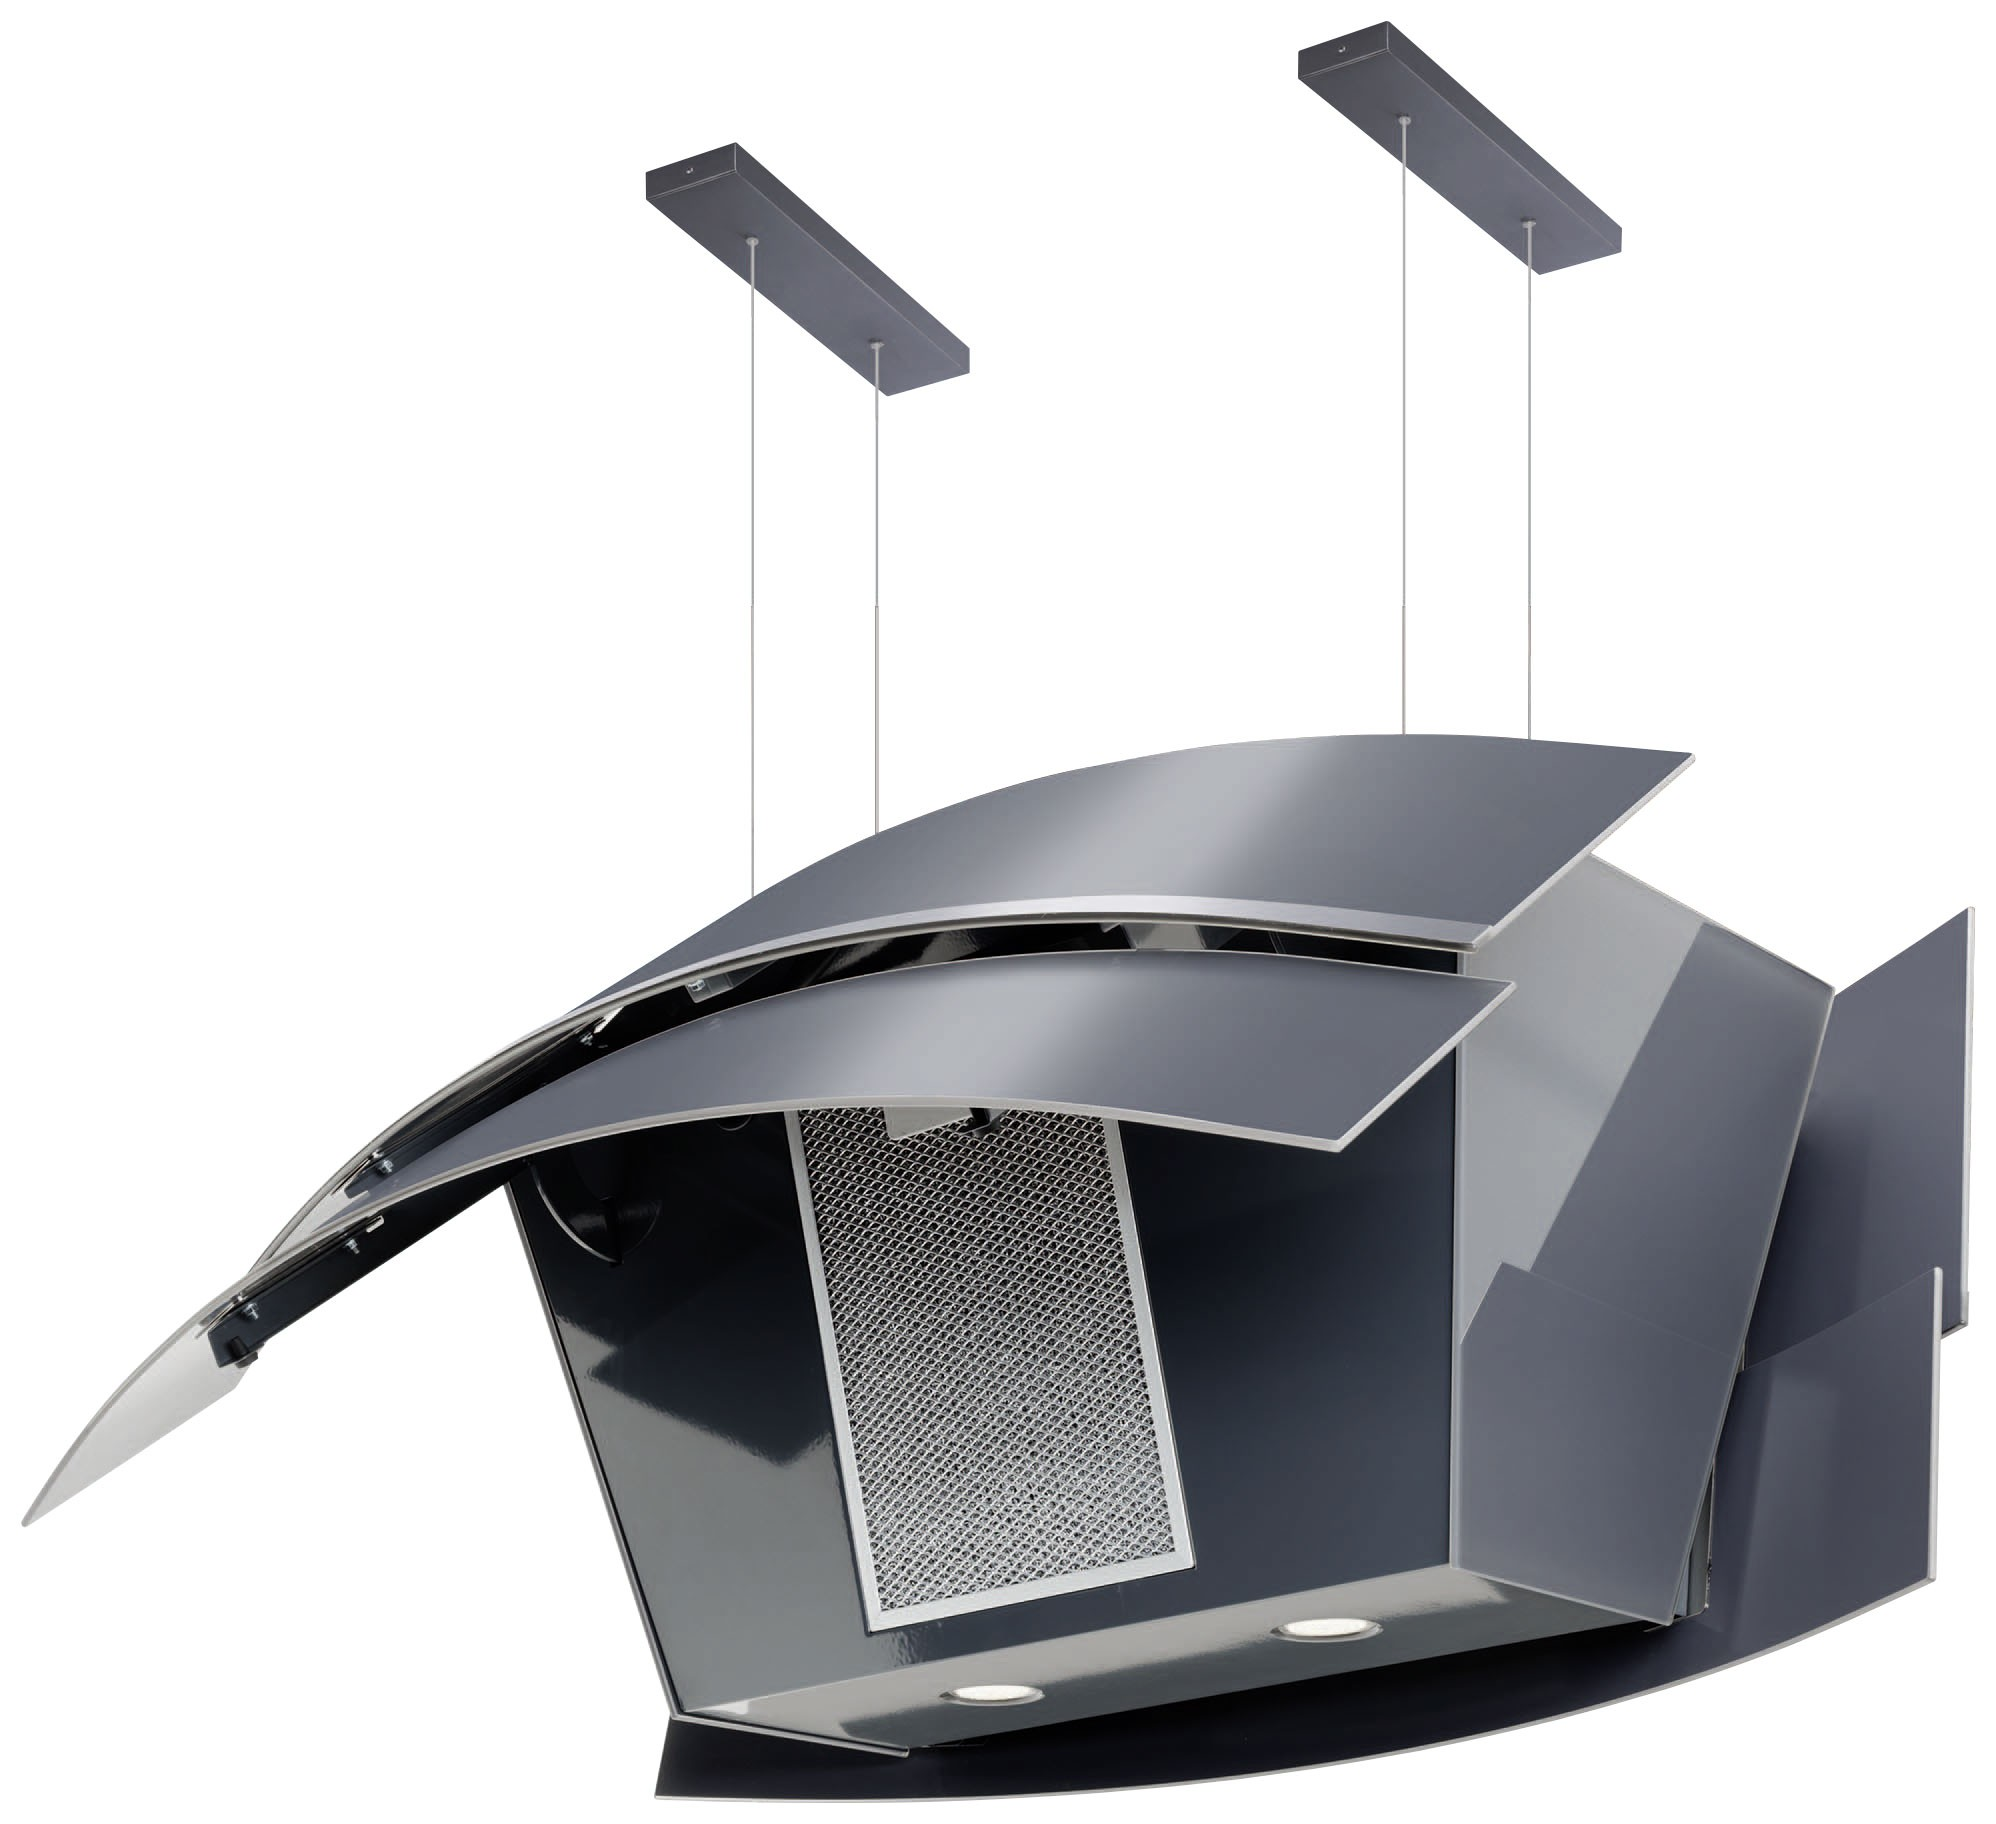 k chenger te kamin und kaminofen gro handel neustrelitz. Black Bedroom Furniture Sets. Home Design Ideas